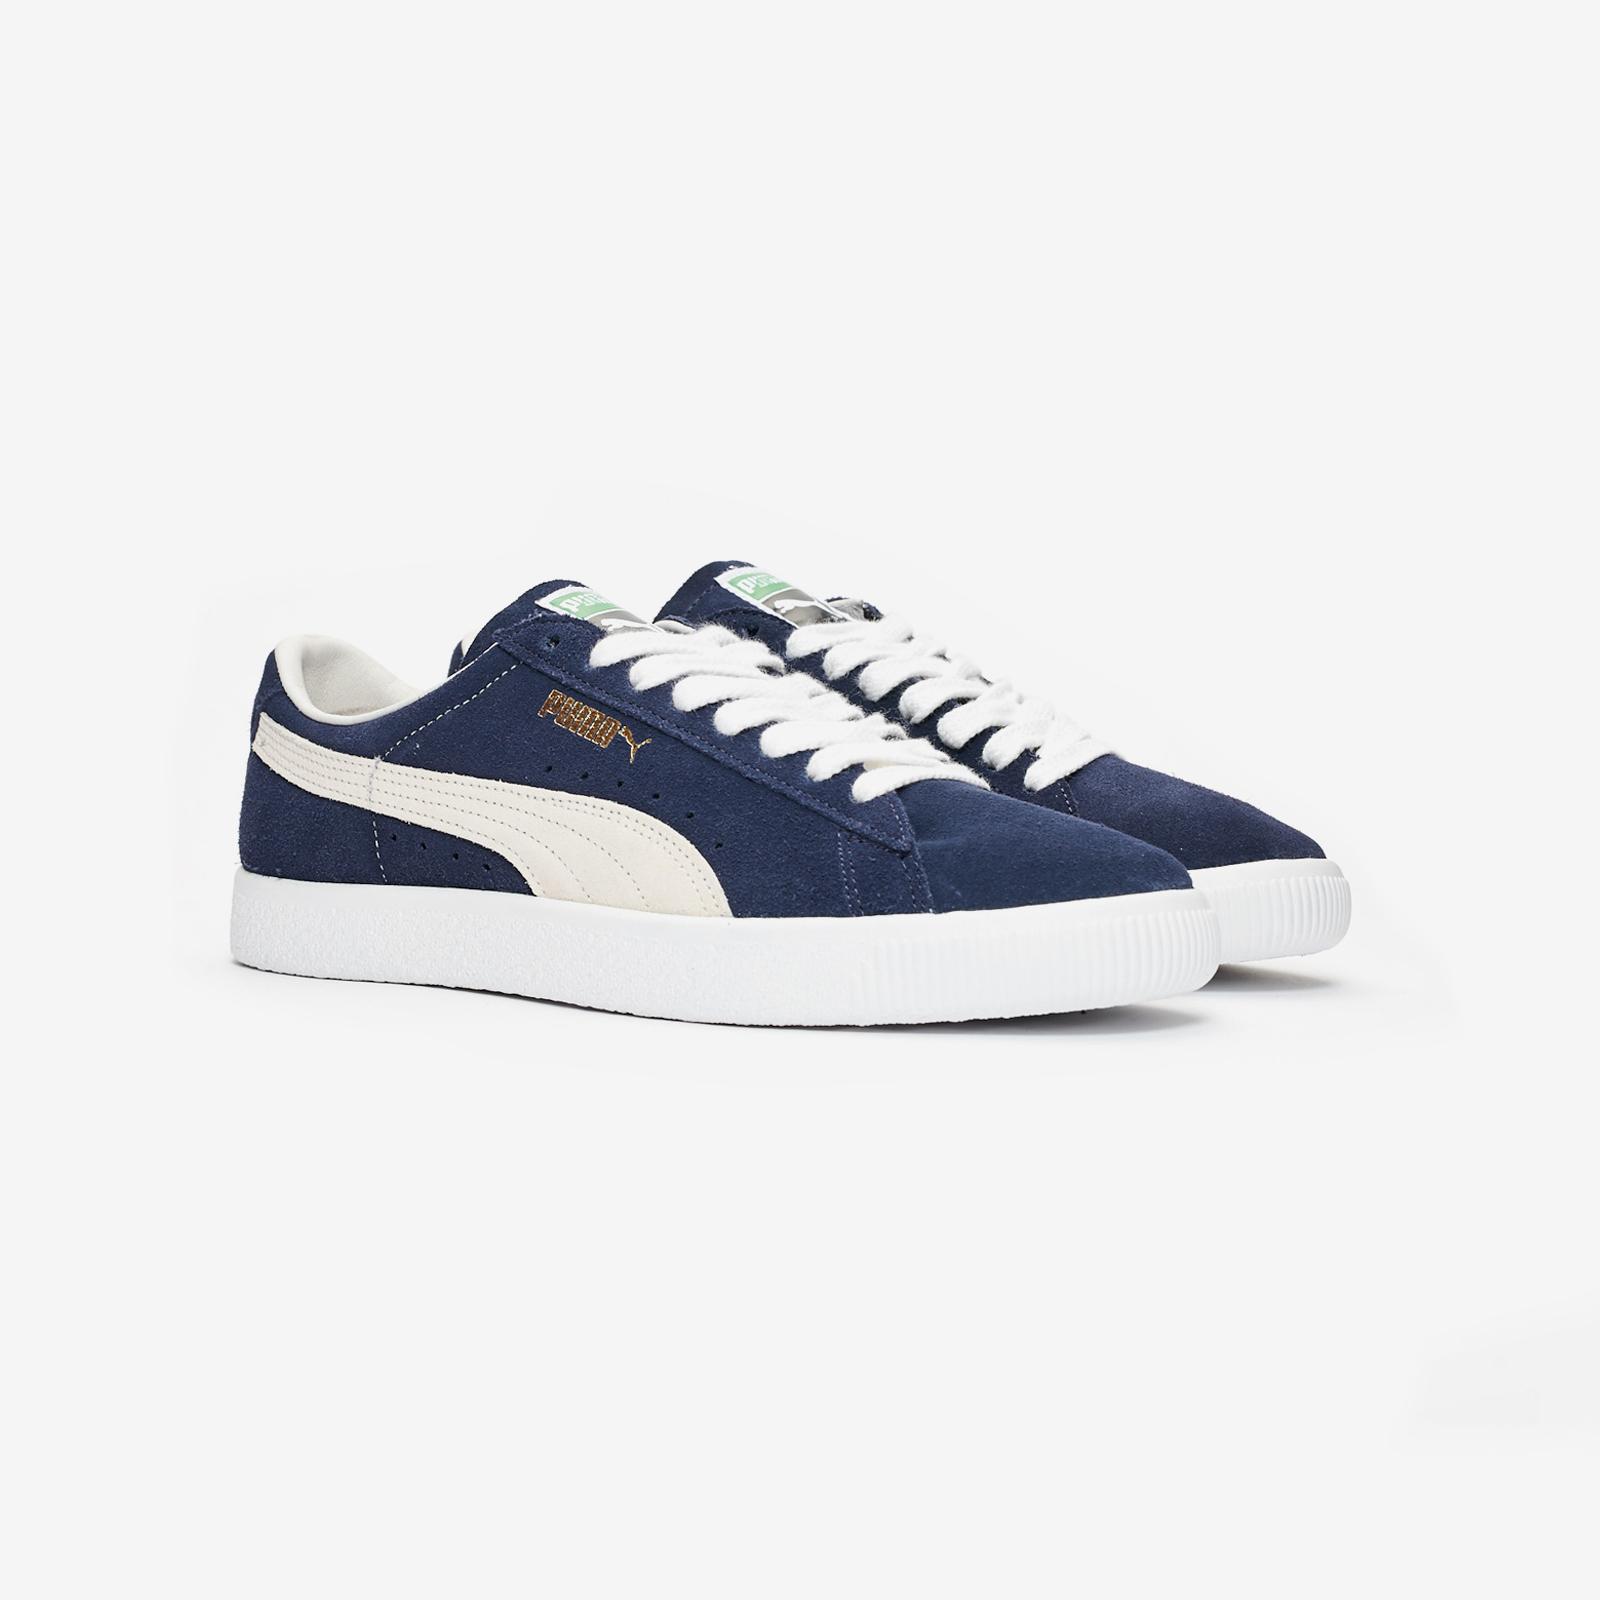 5dbe84d5267 Puma Suede 90681 - 365942-10 - Sneakersnstuff